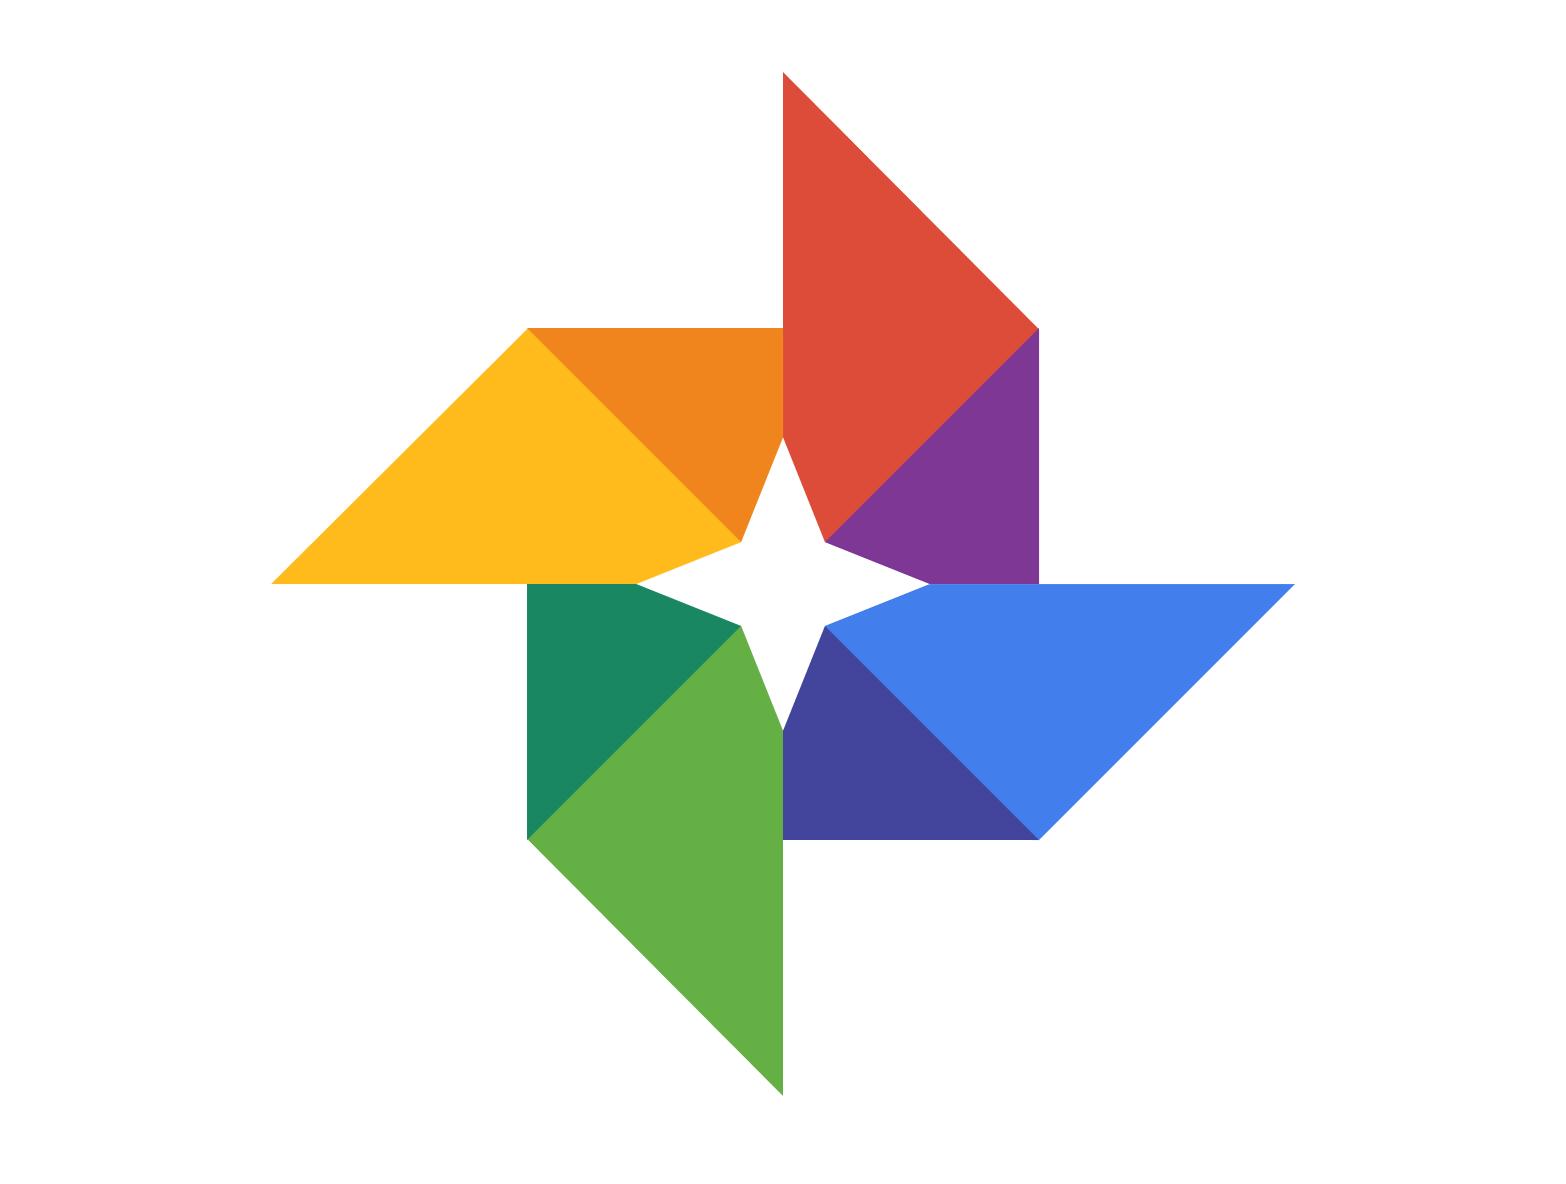 Google-Photos-Post-02-07